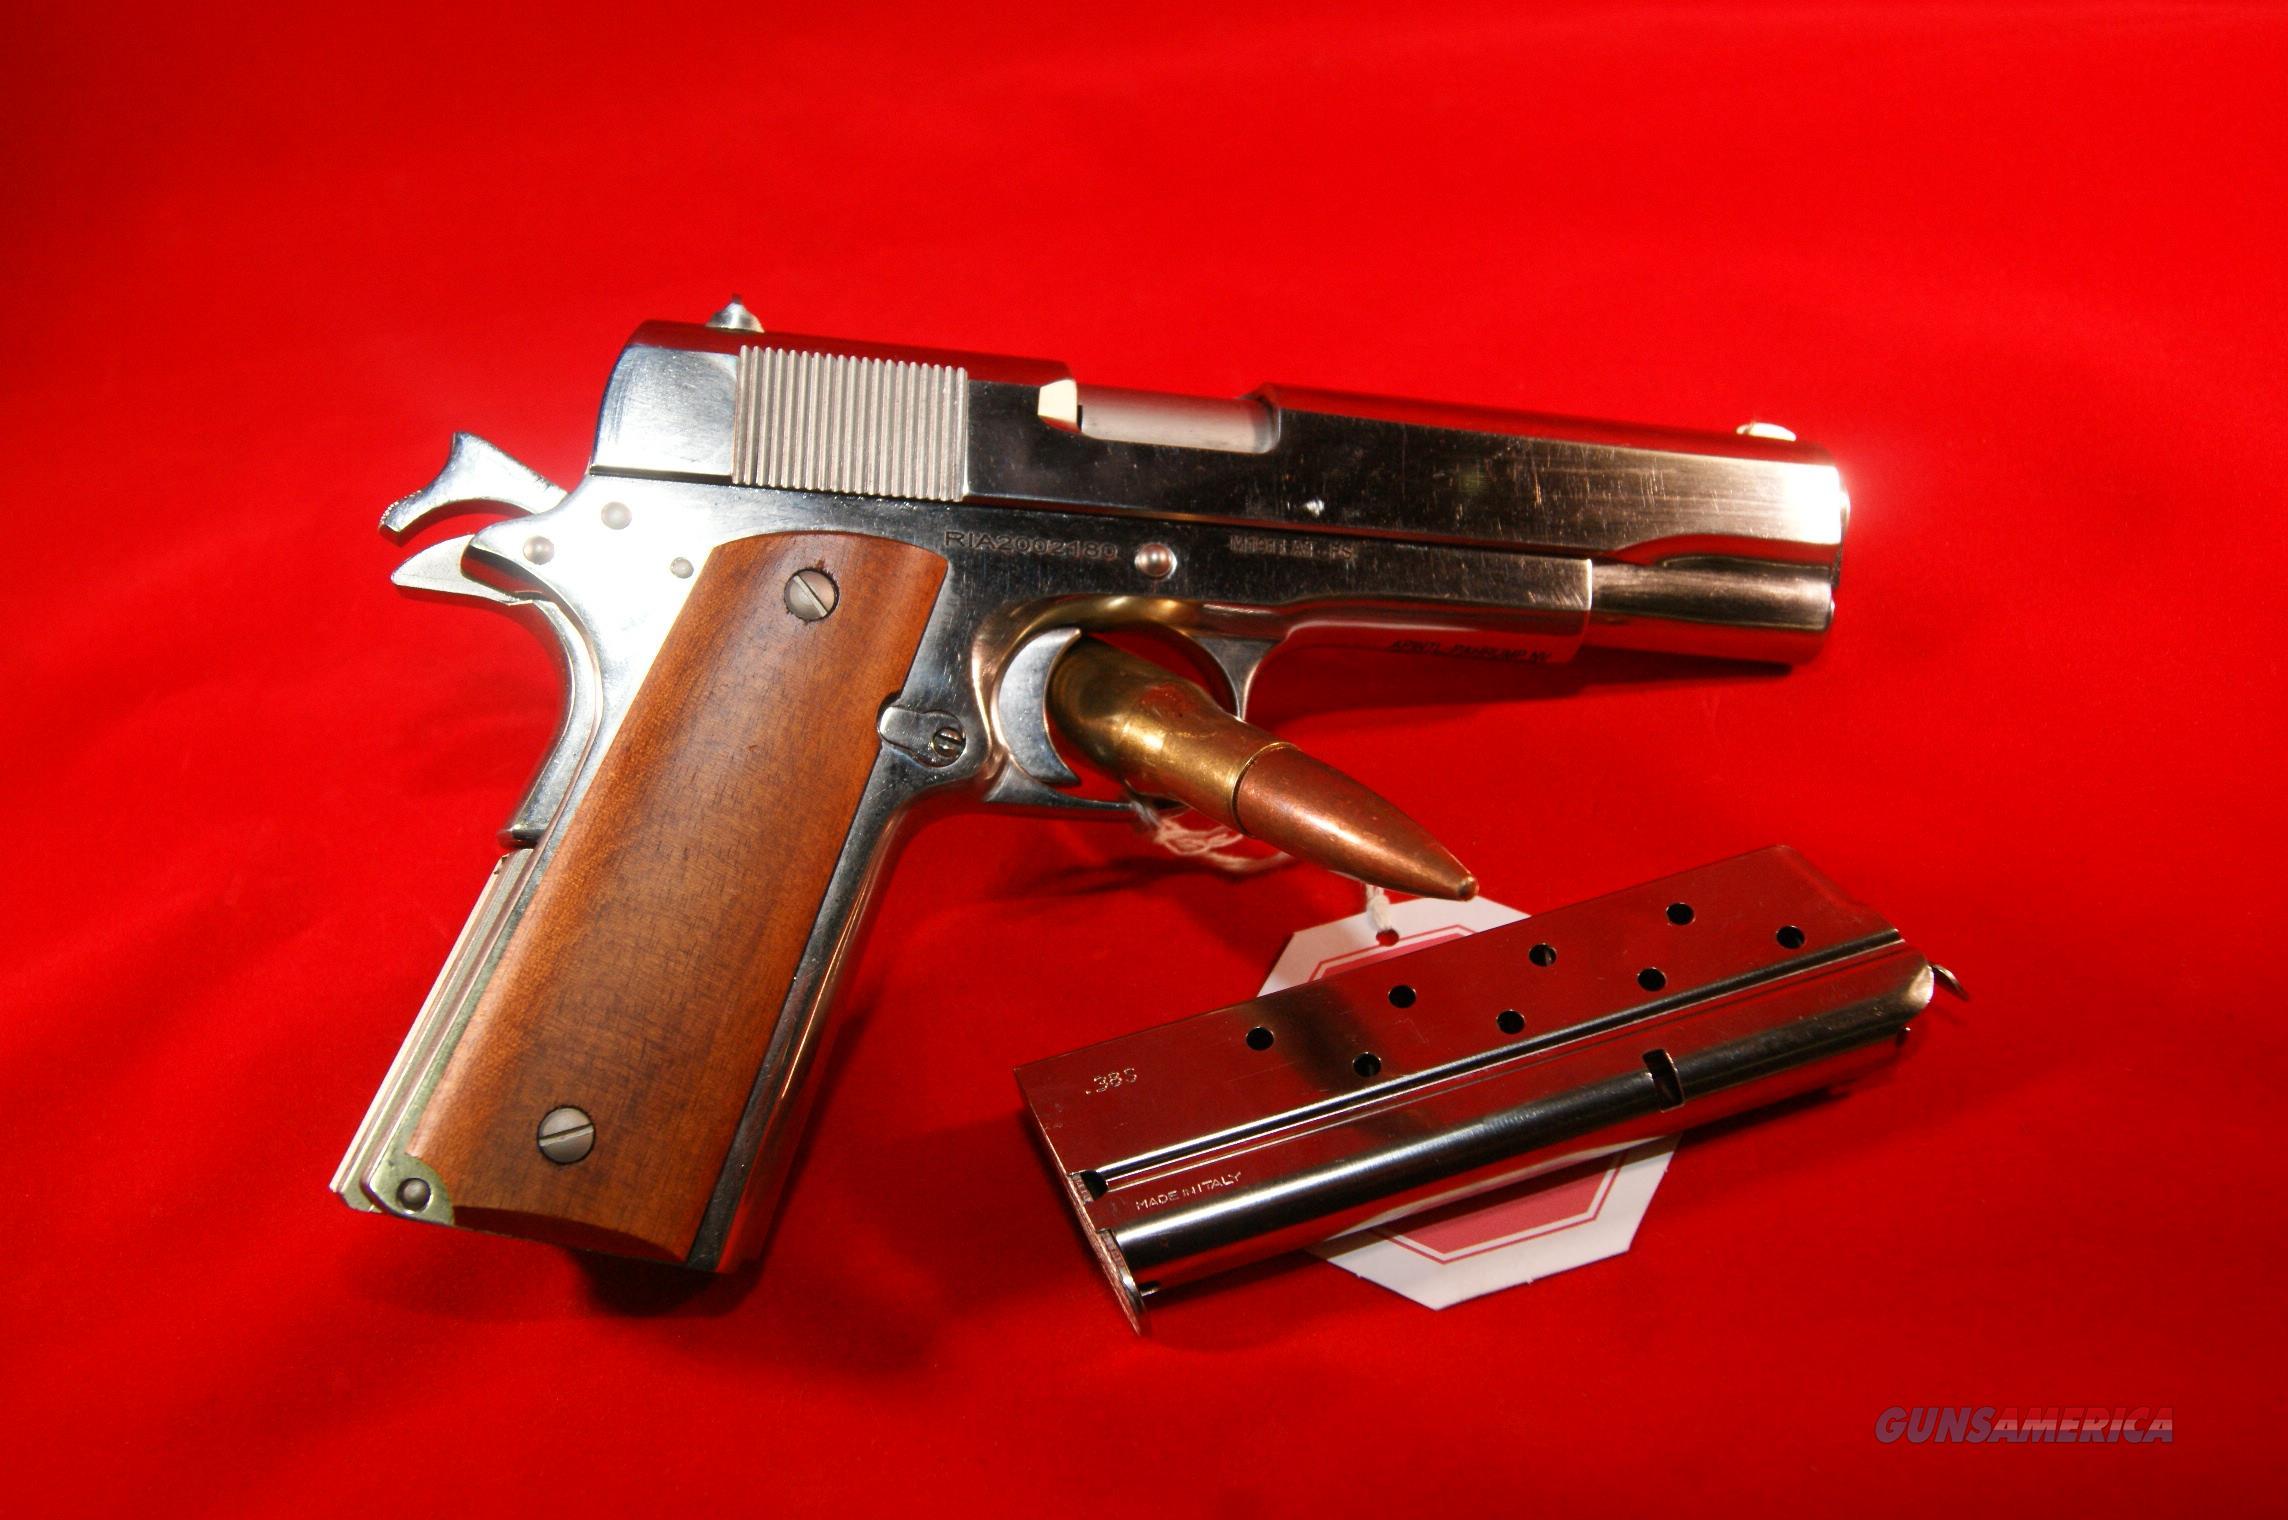 Rock Island 1911-A1 GI Standard FS Nickel 38 Super & Free Shipping!  Guns > Pistols > 1911 Pistol Copies (non-Colt)